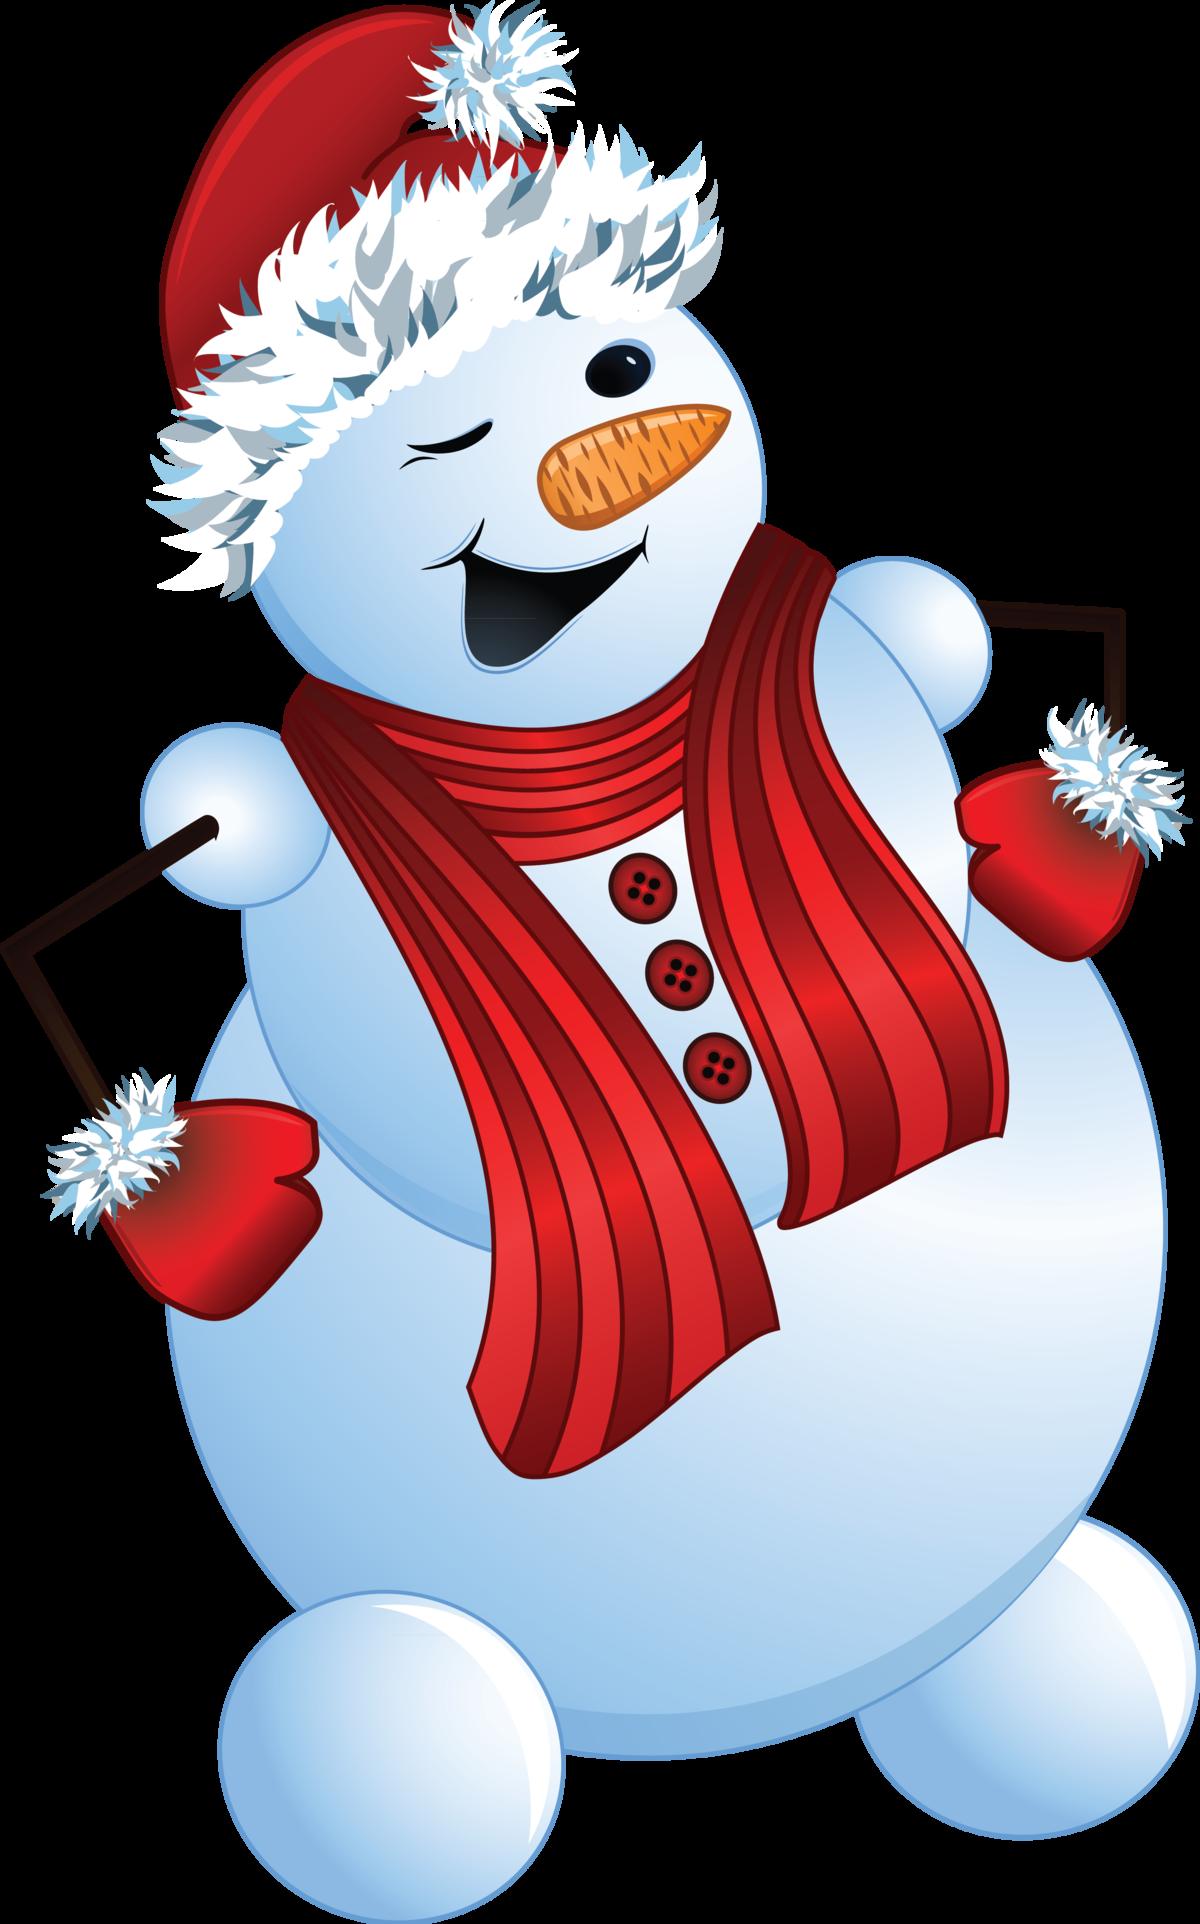 Веселый снеговик картинки на прозрачном фоне